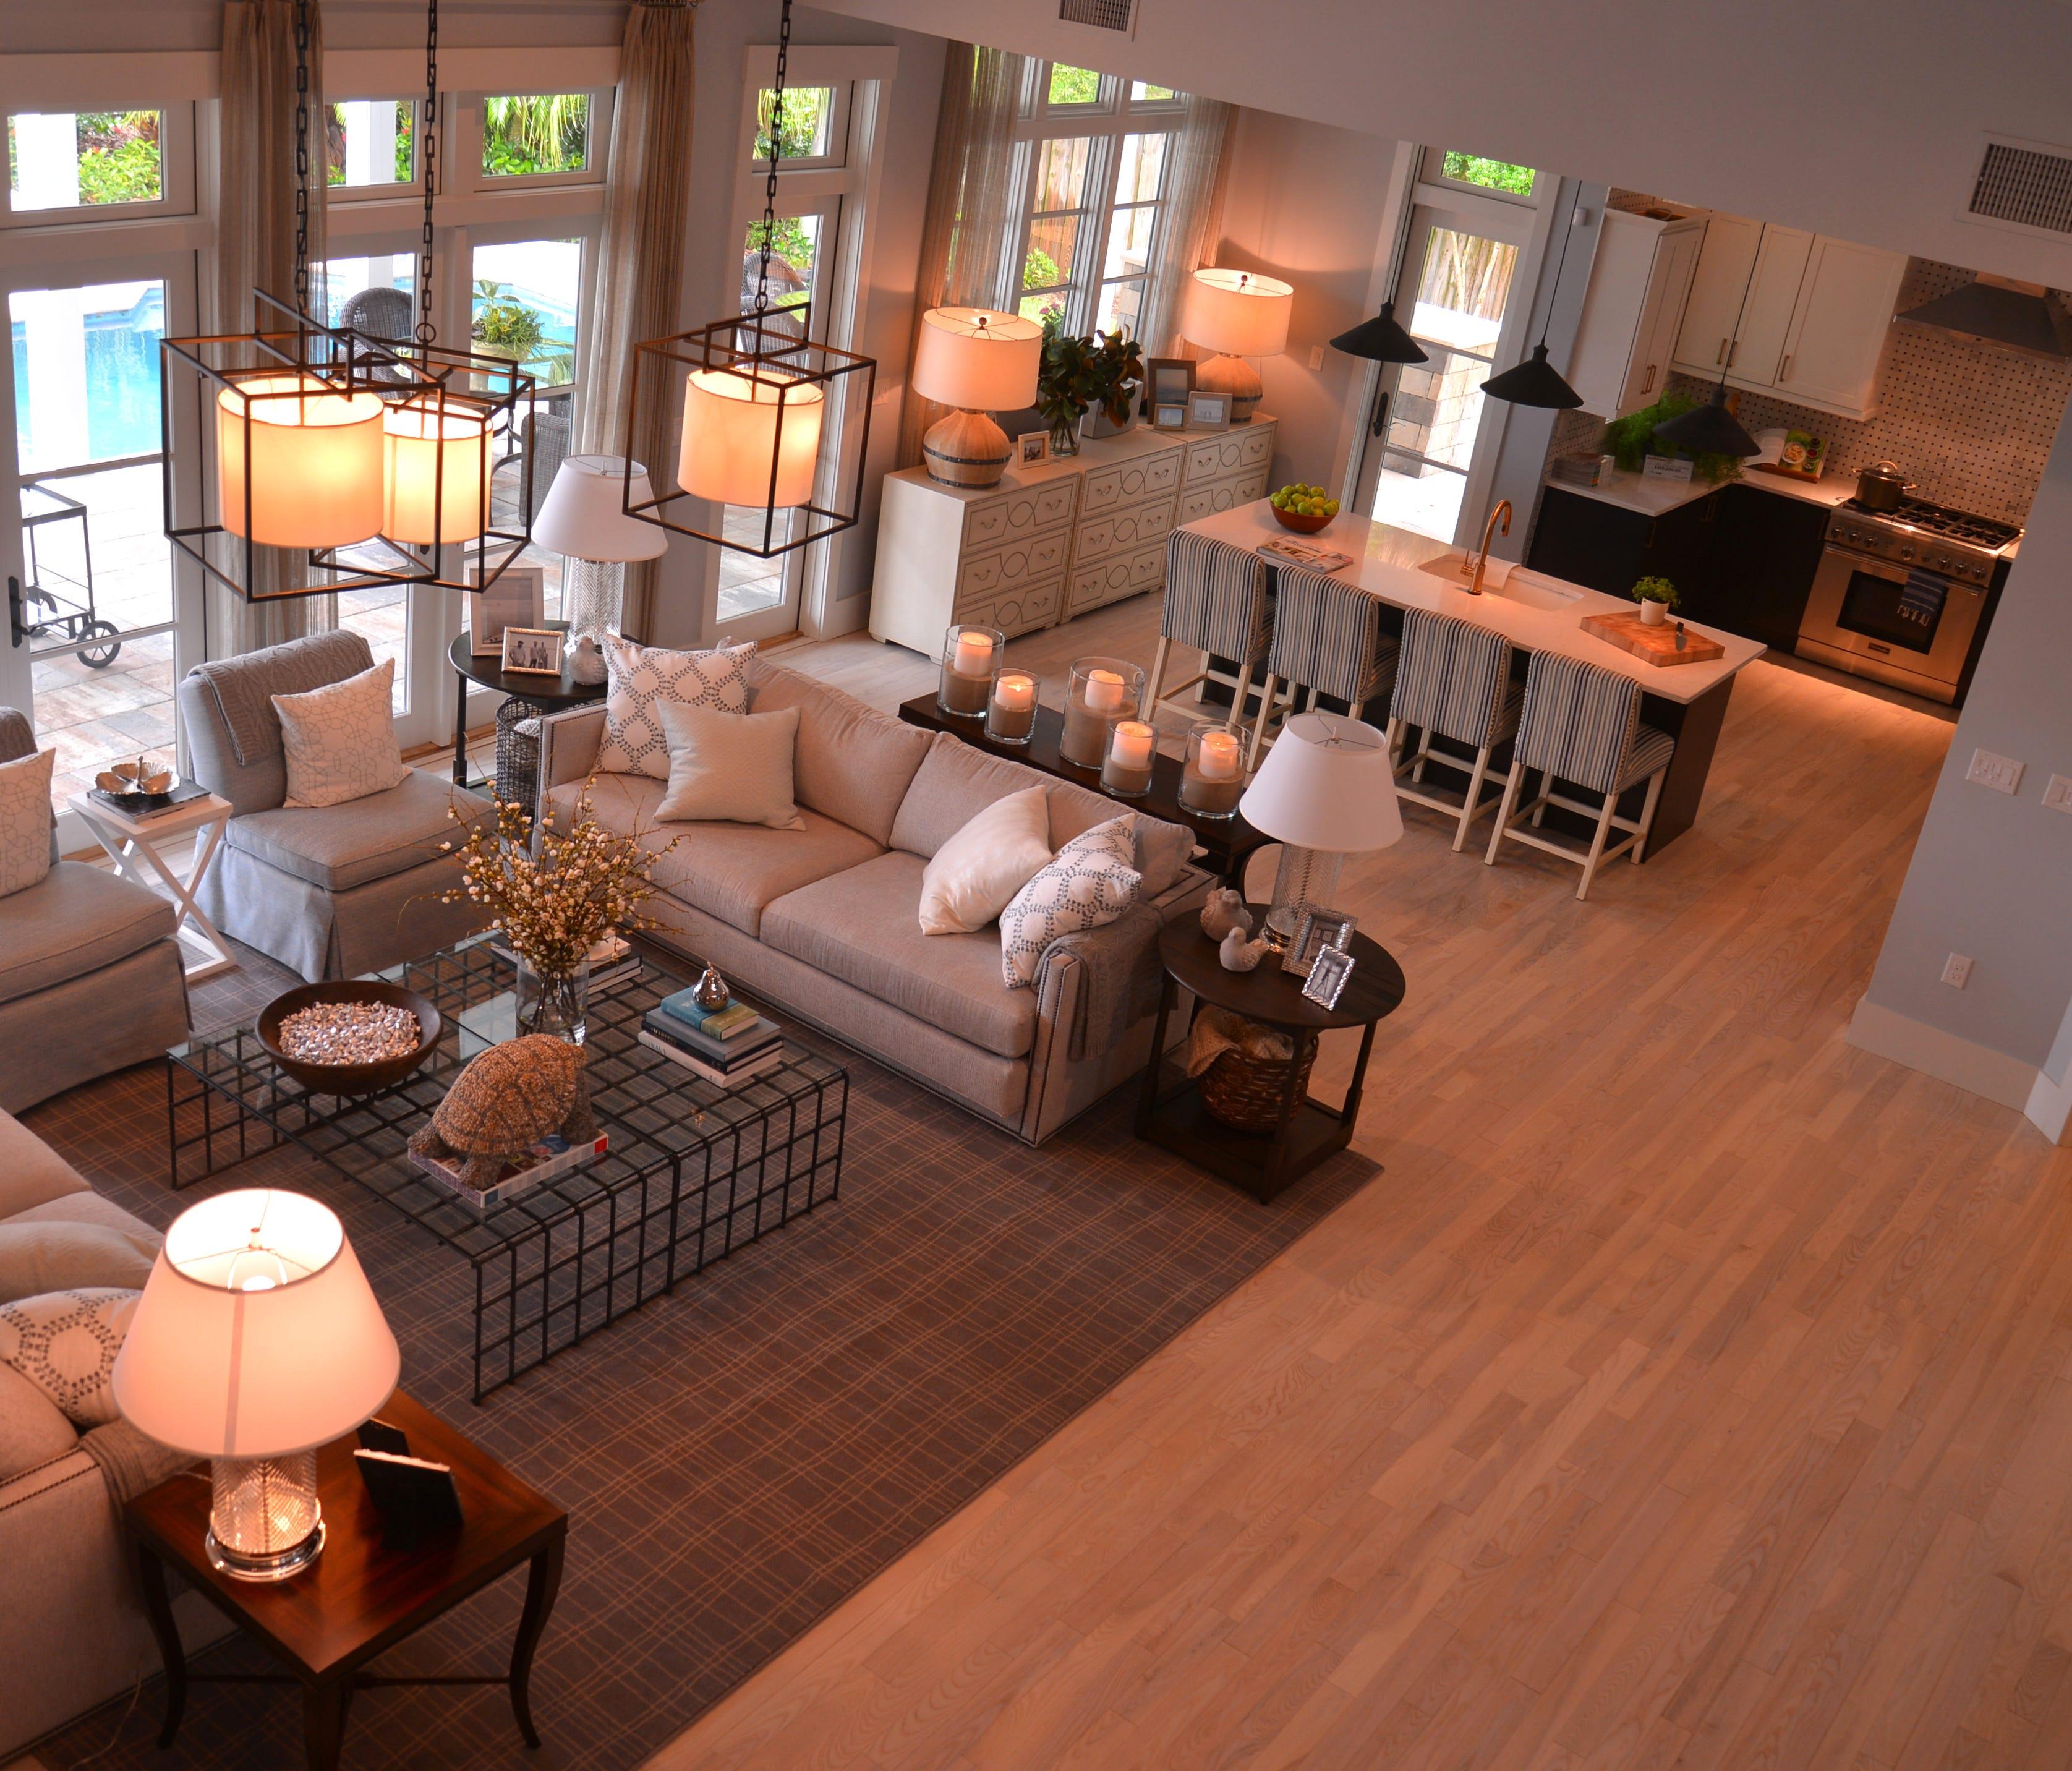 Hgtv Dream Home 2015: Florida HGTV Dream Home Sells For $1.3M